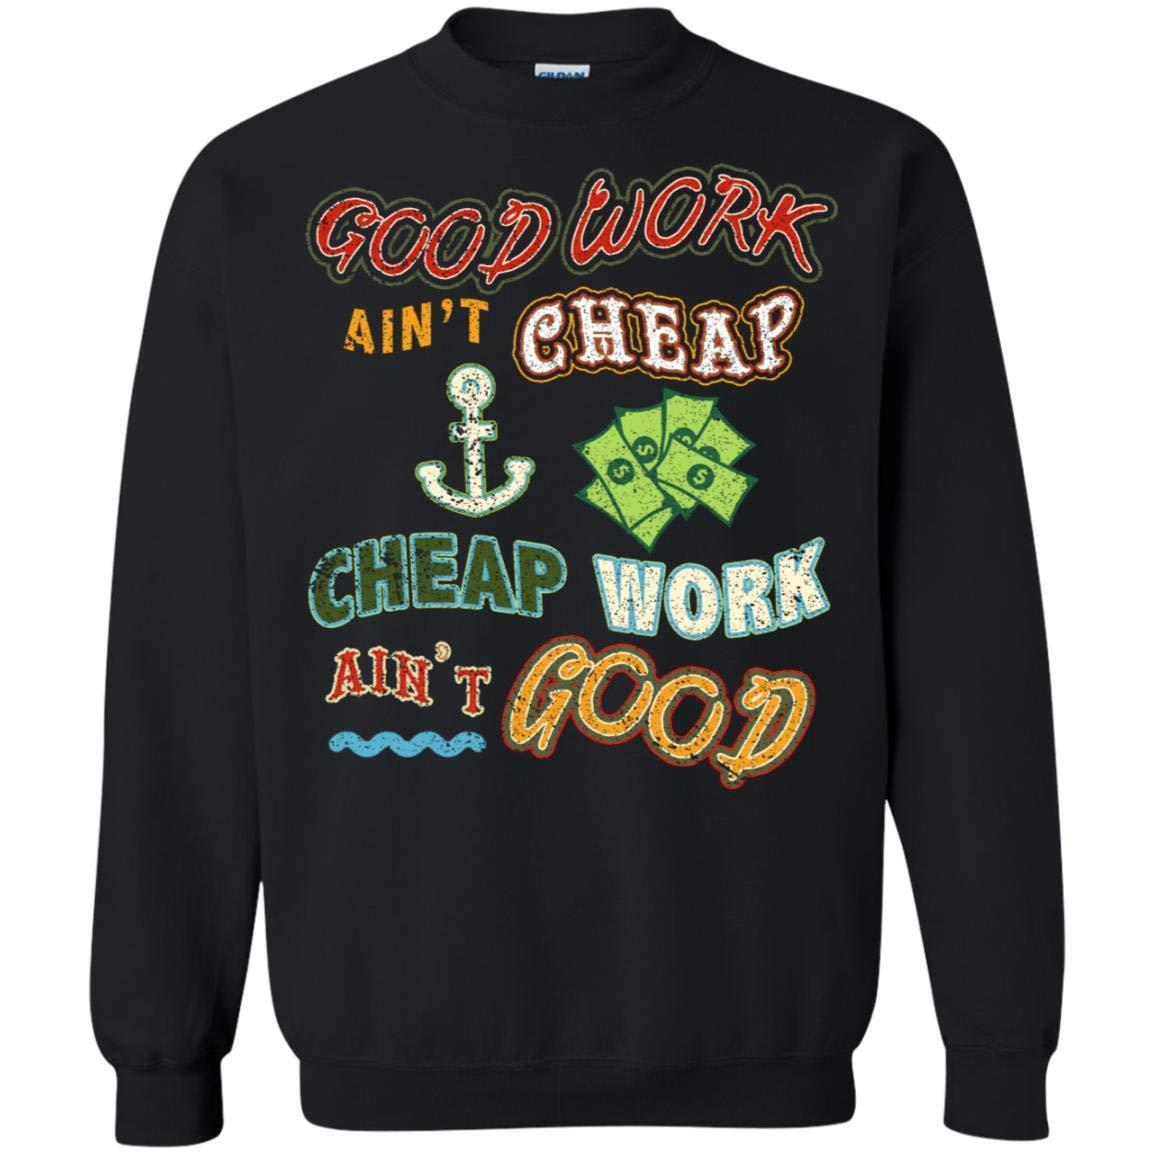 Teelesto Gook Work Aint Work Aint Good Shirt